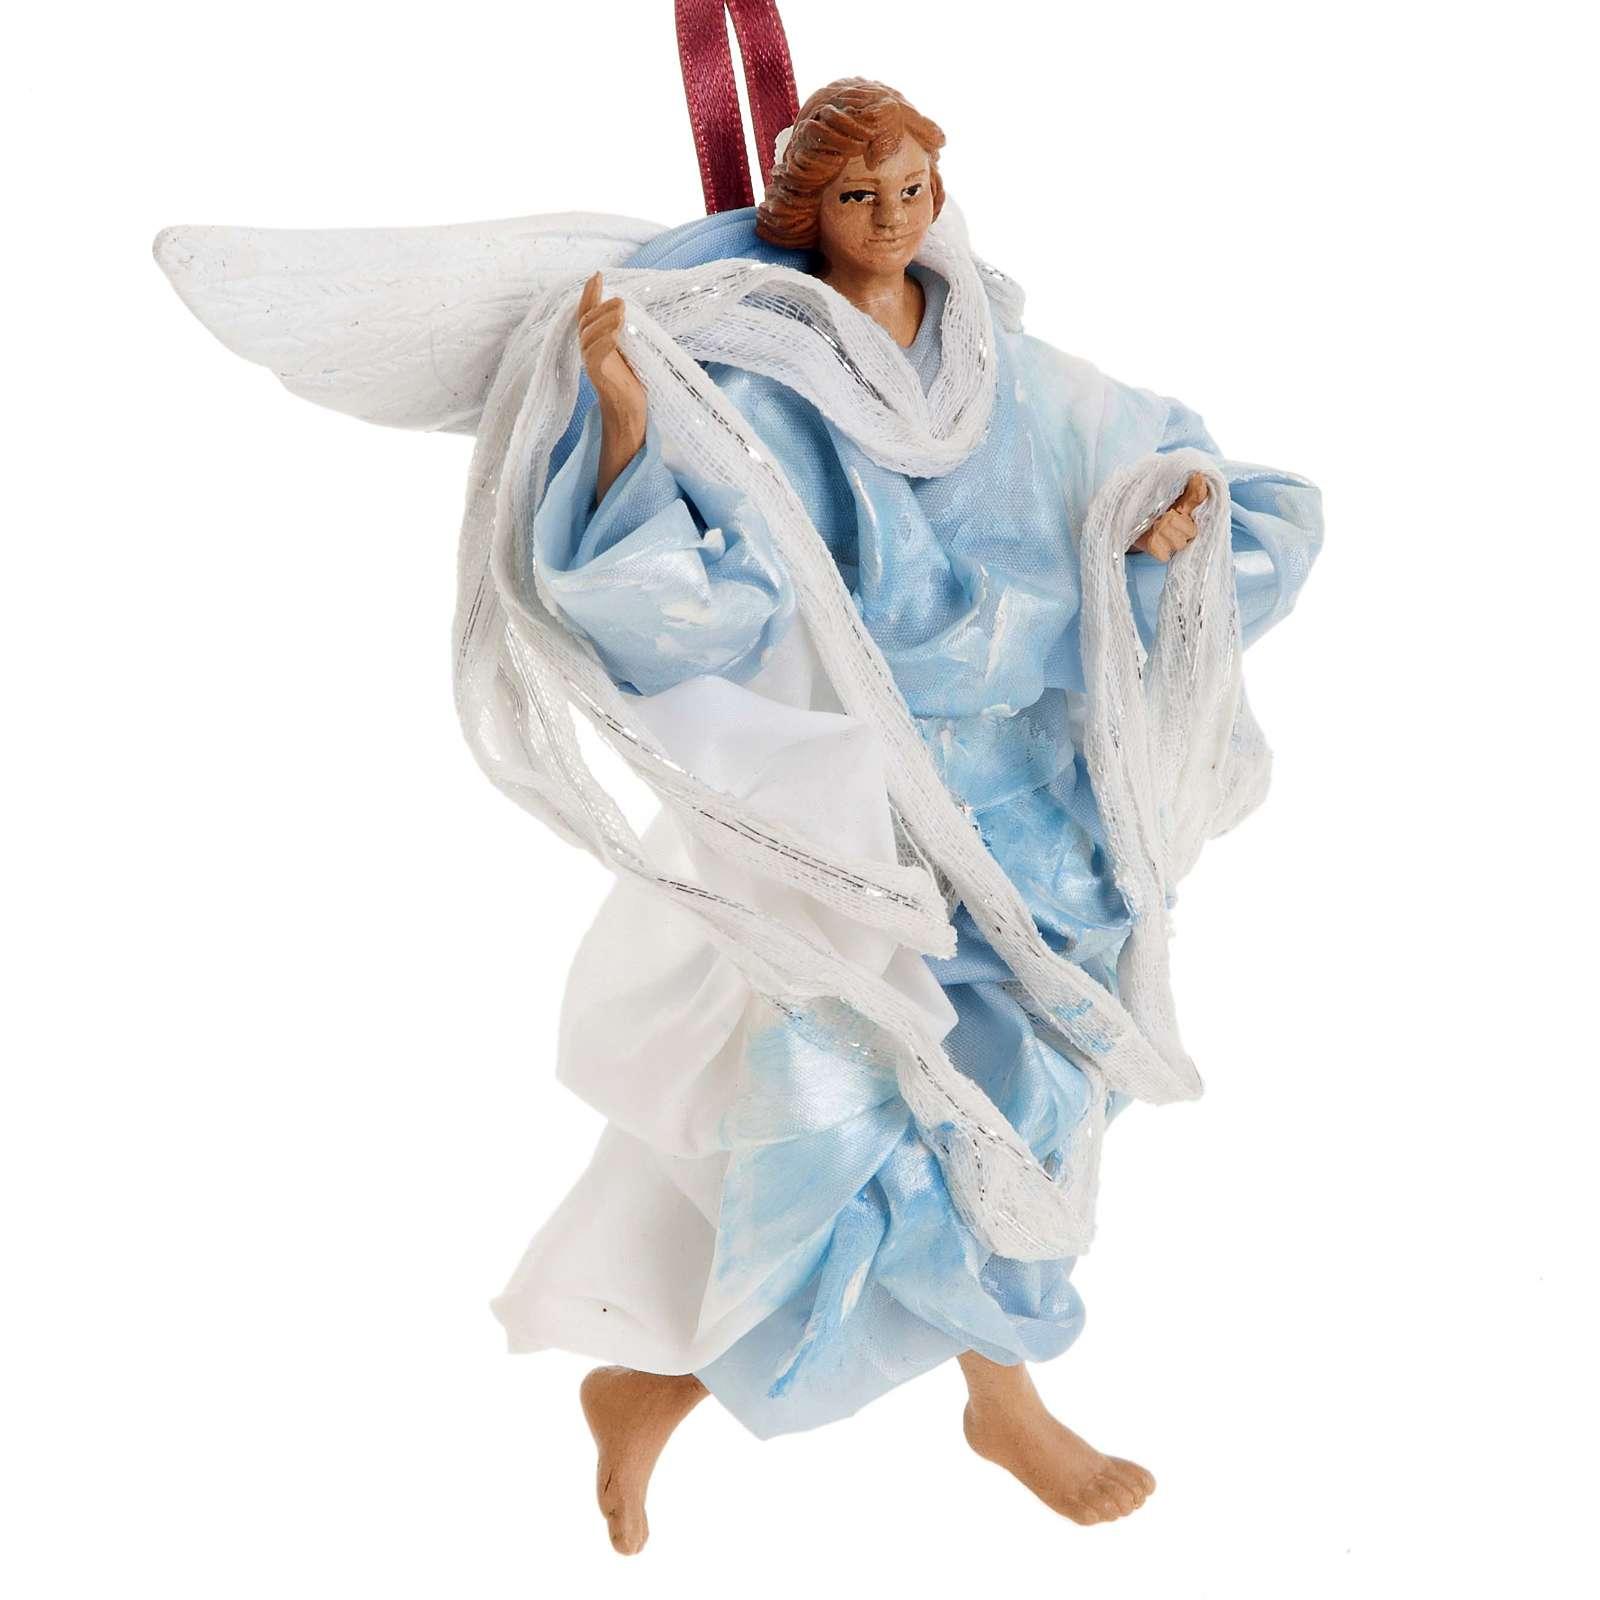 Angelo azzurro 18 cm presepe napoletano 4